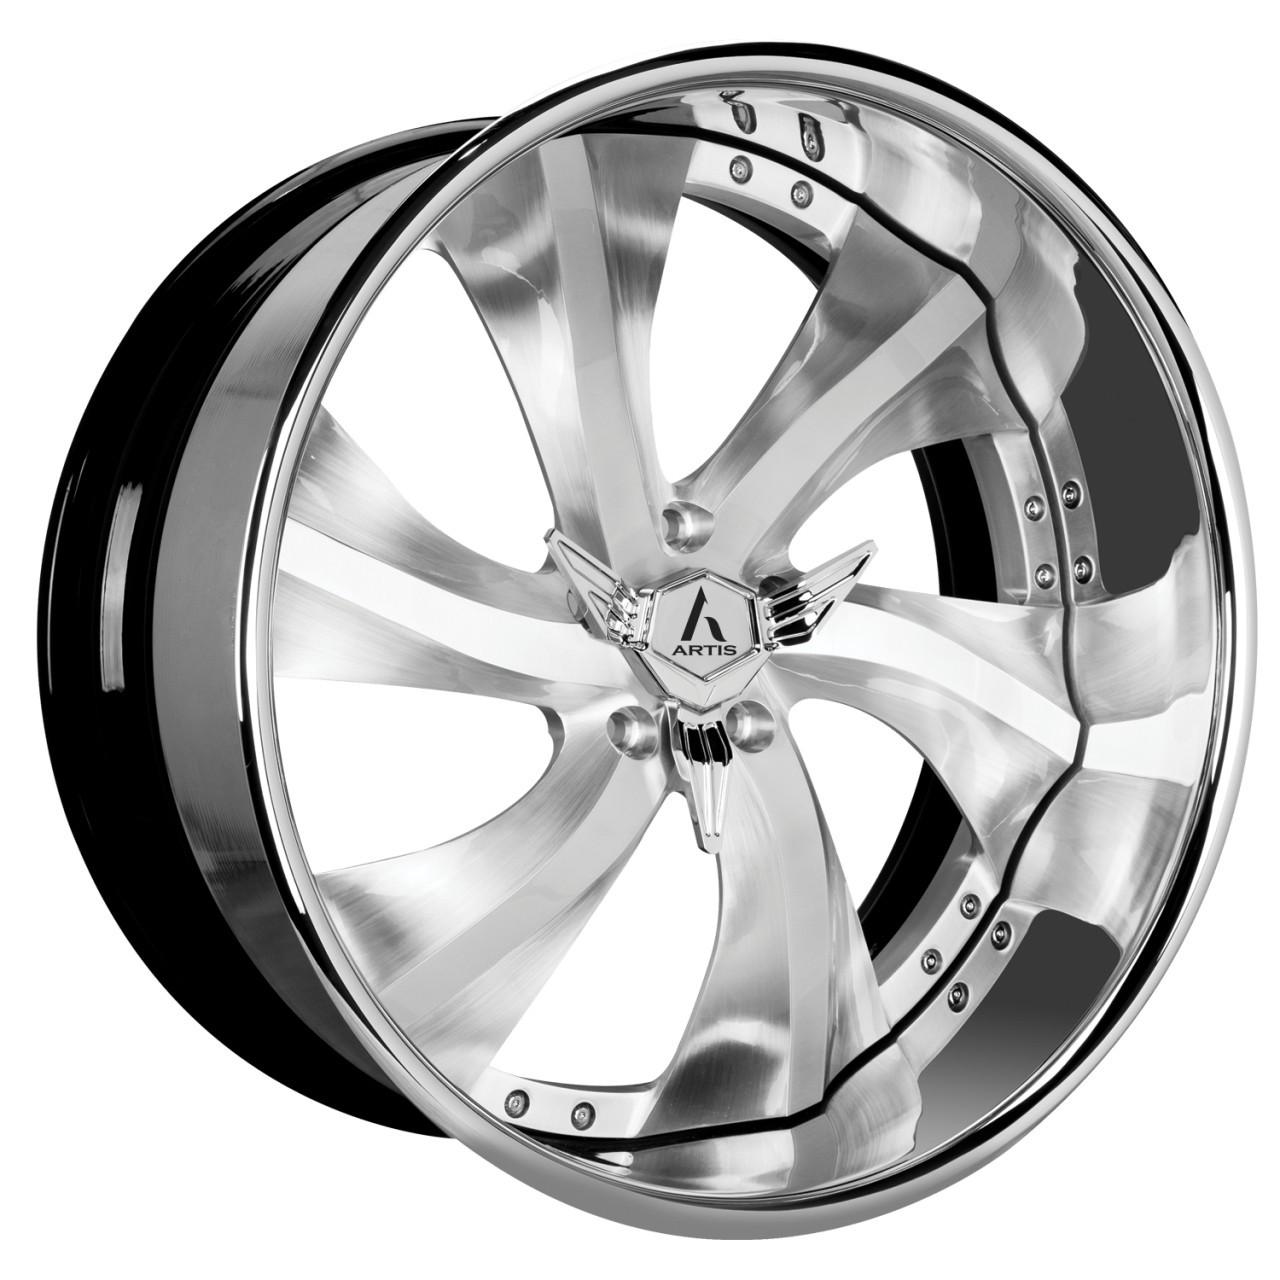 Artis Boss forged wheels